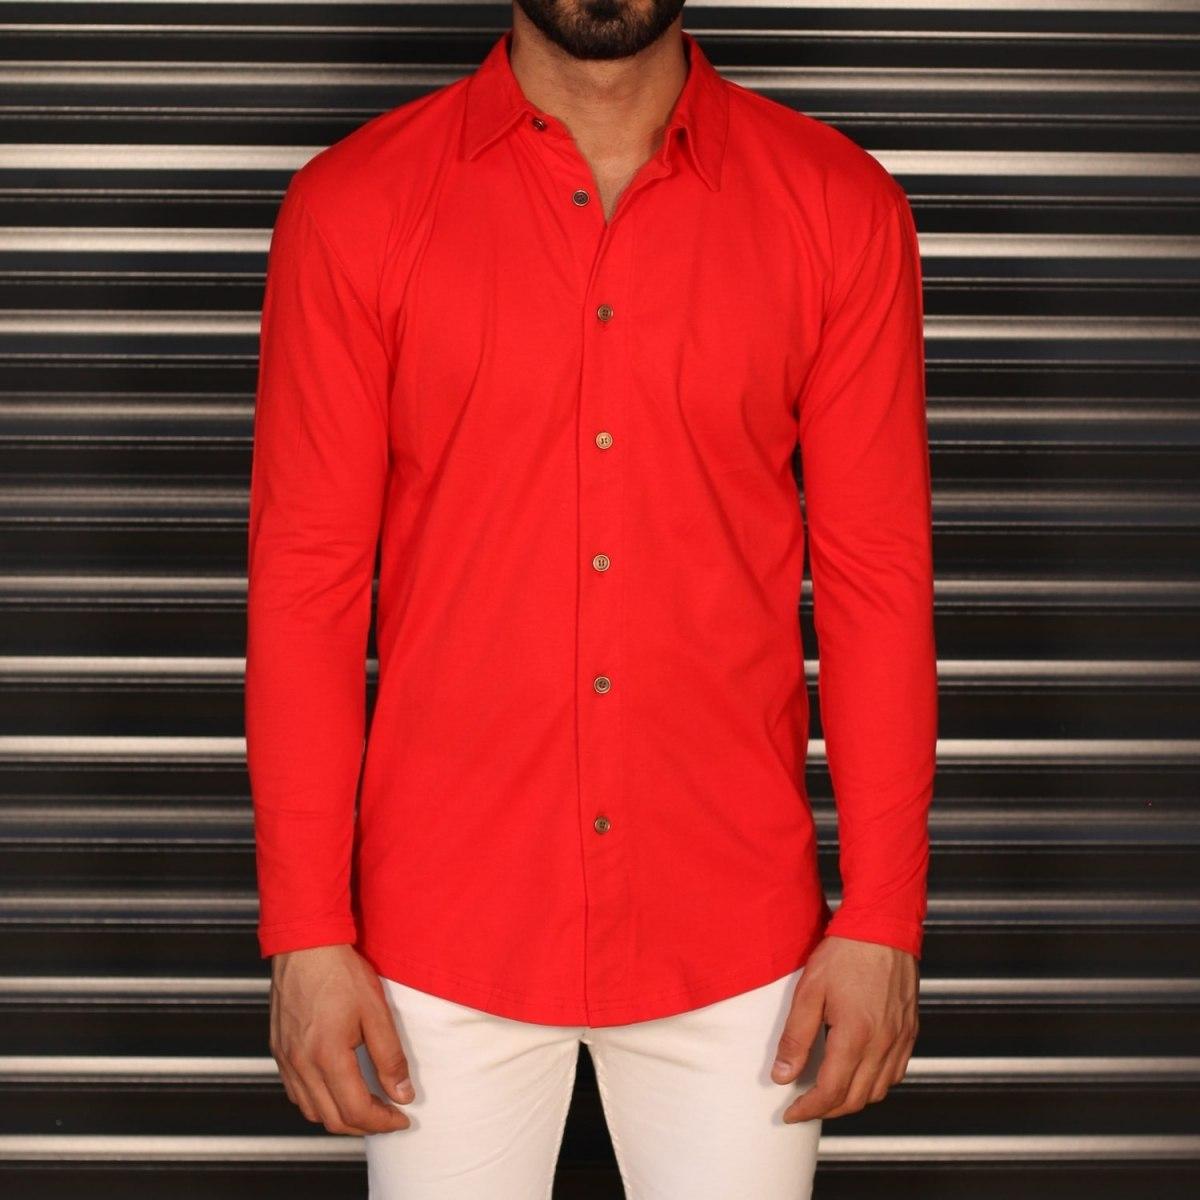 Men's Regular Long Sleeve Casual Shirt In Red Mv Premium Brand - 1